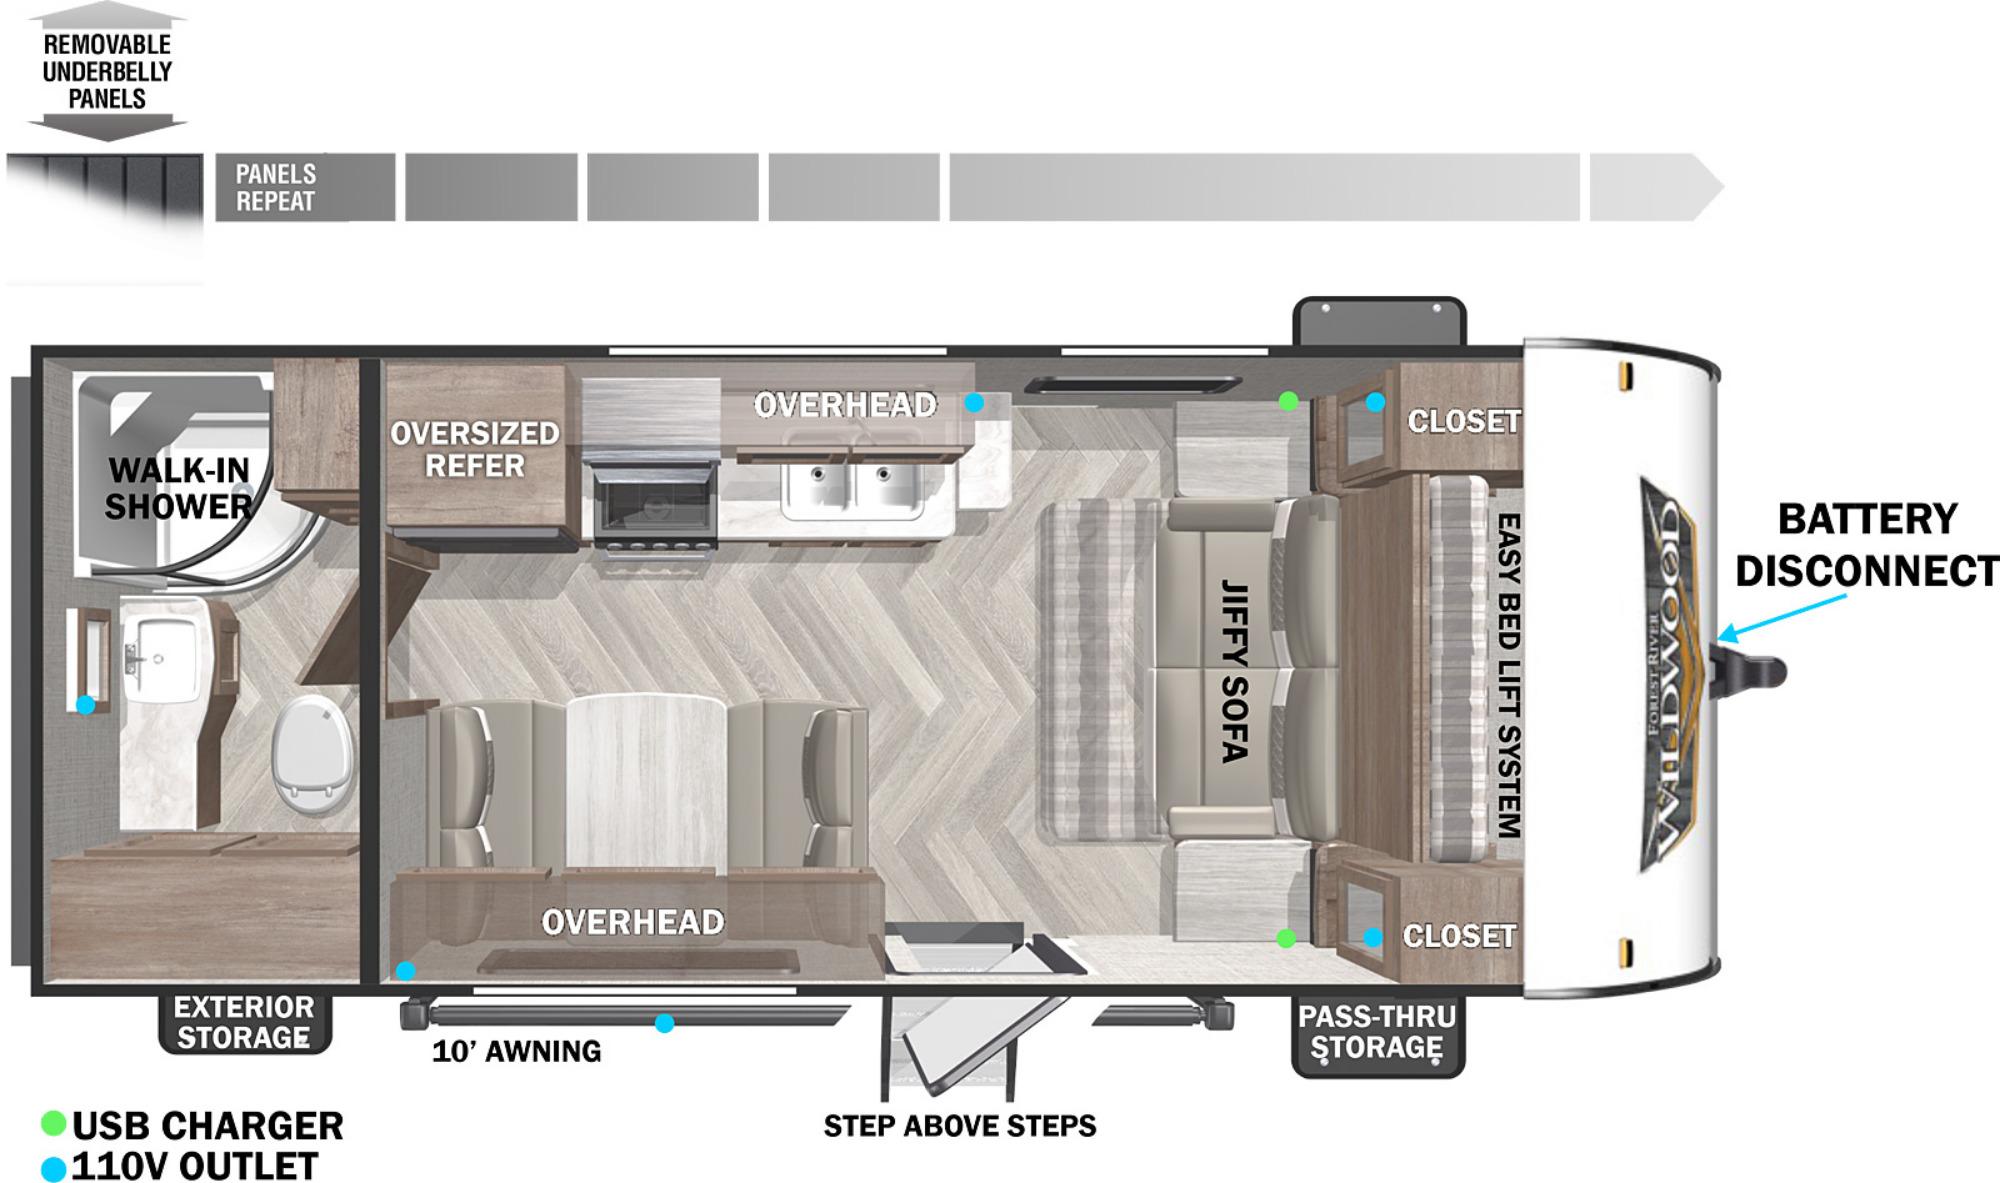 View Floor Plan for 2022 FOREST RIVER WILDWOOD X-LITE 171RBXL